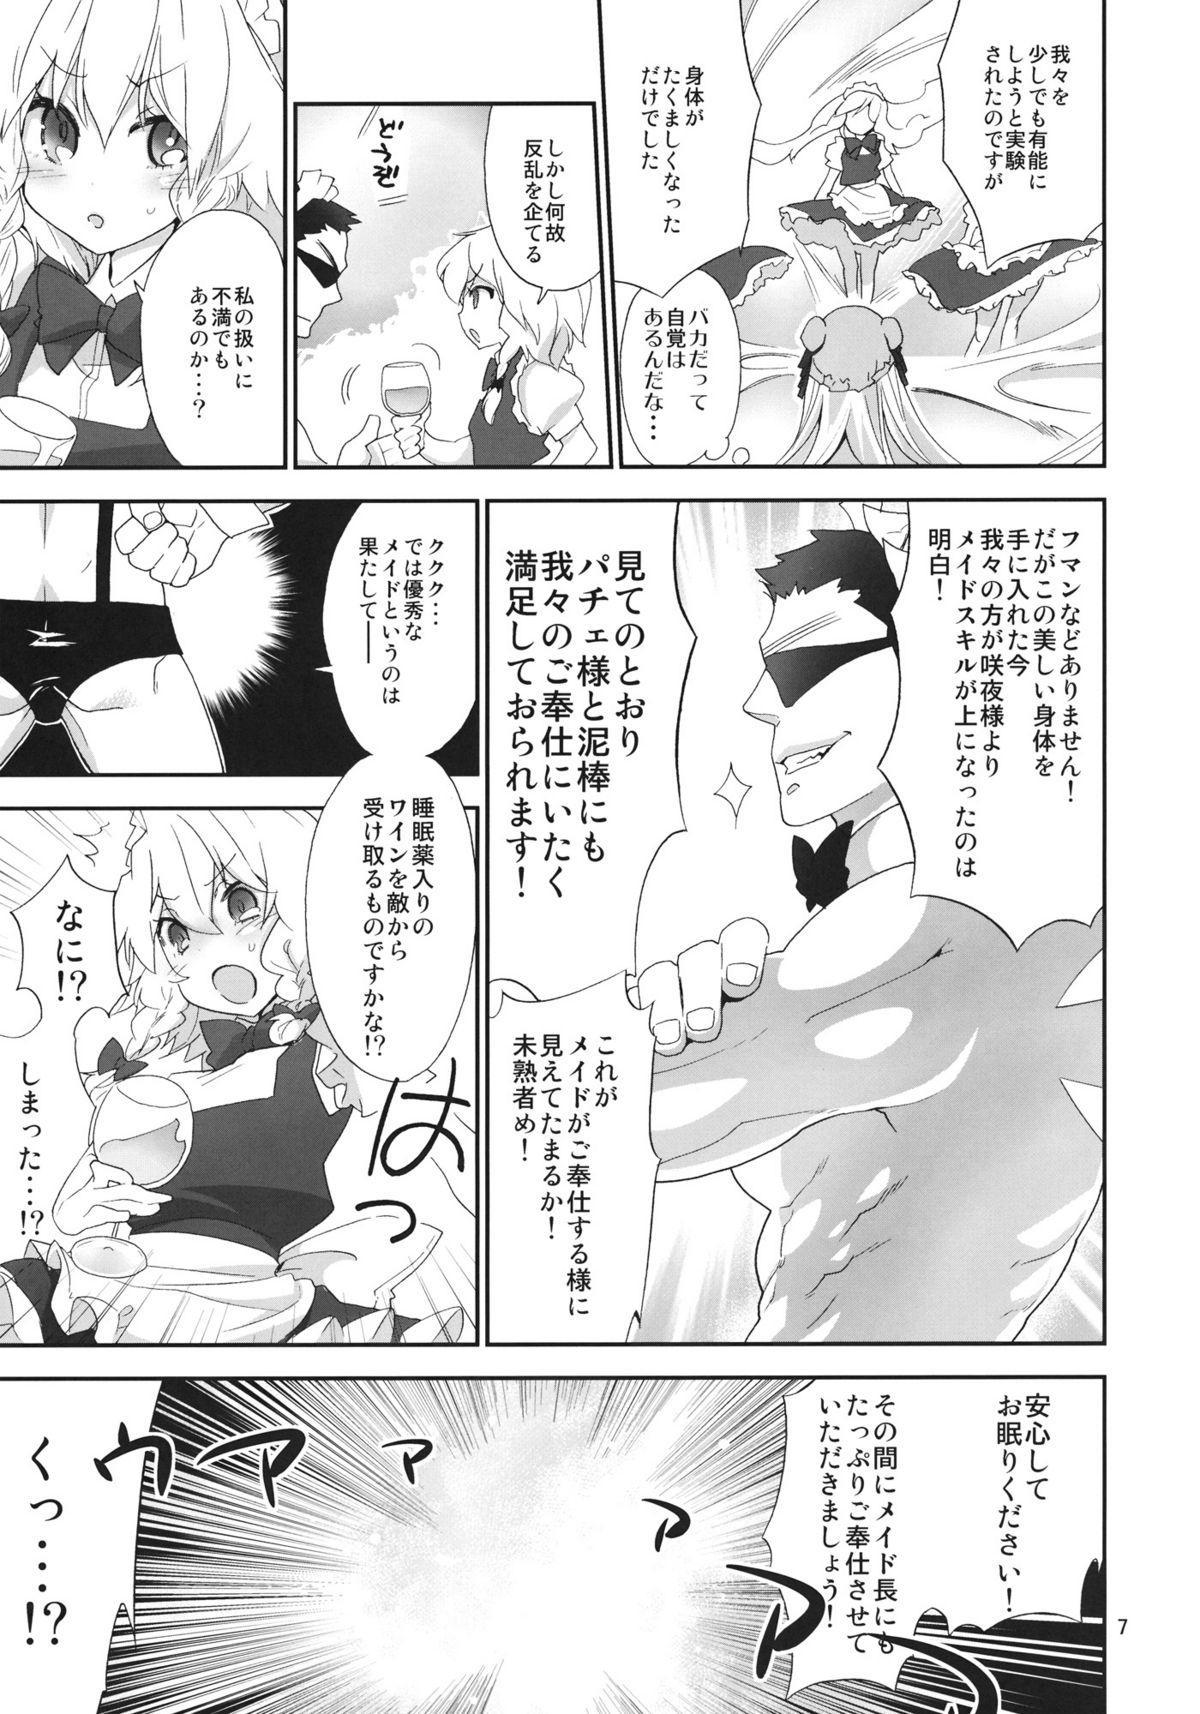 Yousei Maid-san no Hanran 5